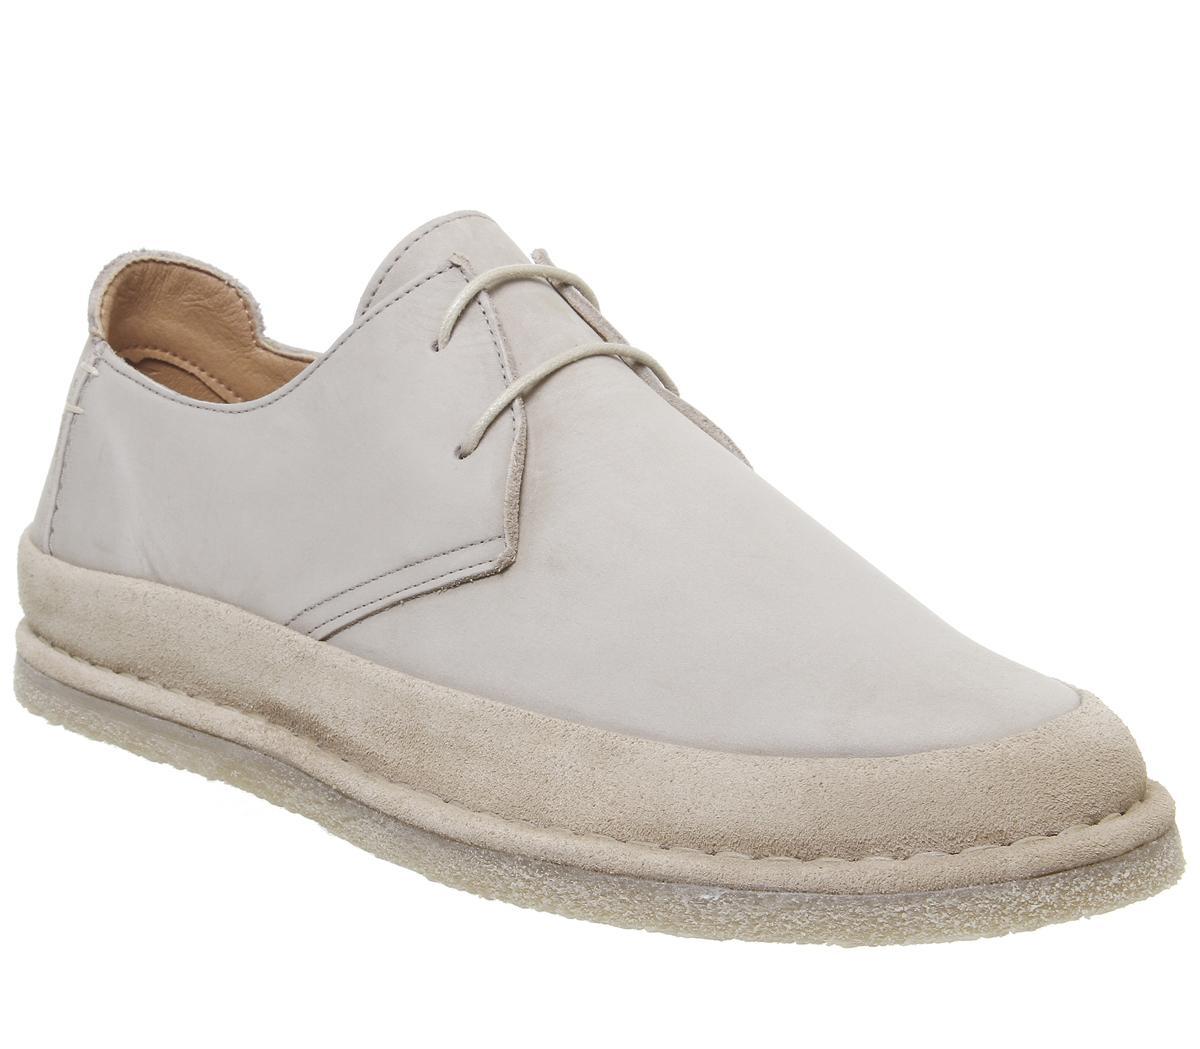 Mens Office Lark Derby Lace Up Shoes Beige Nubuck Casual Shoes